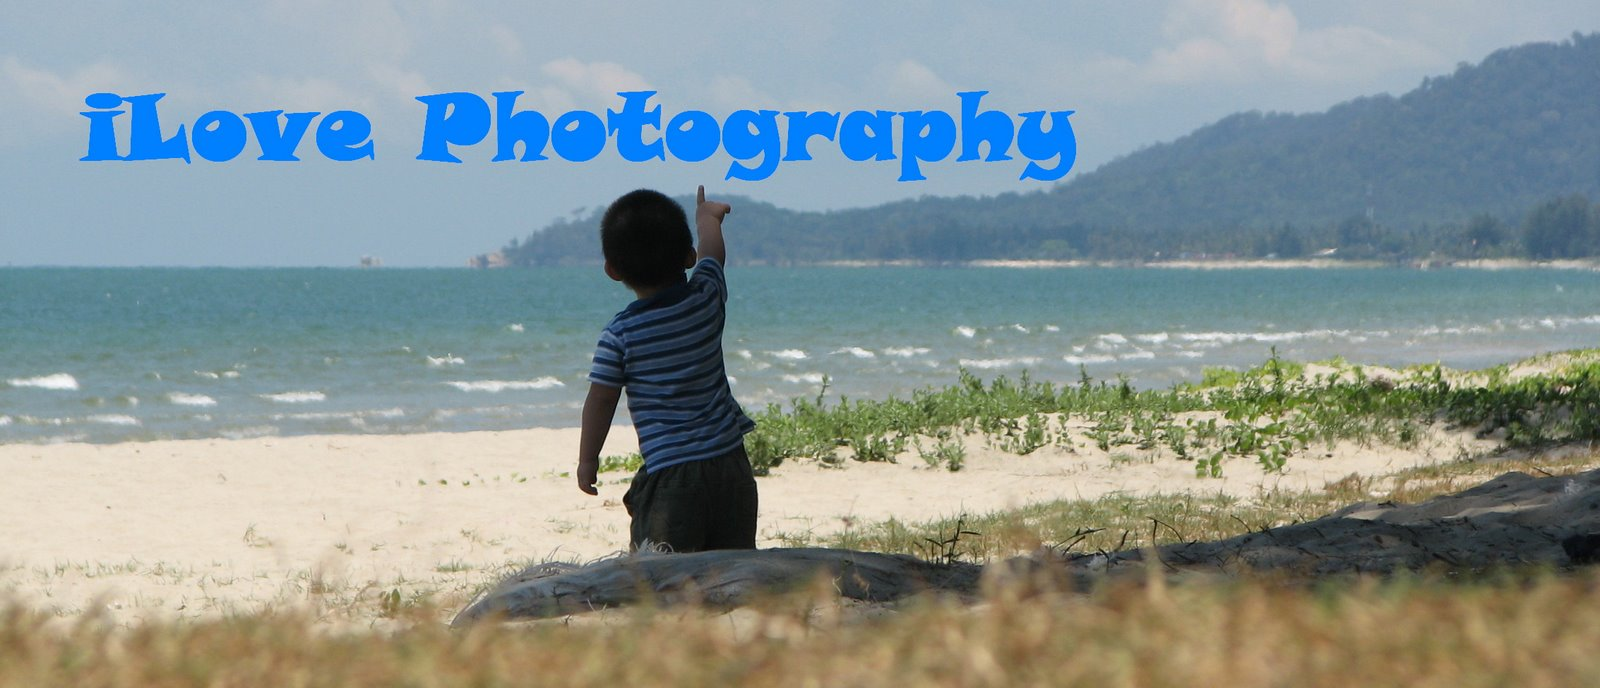 iLove Photography